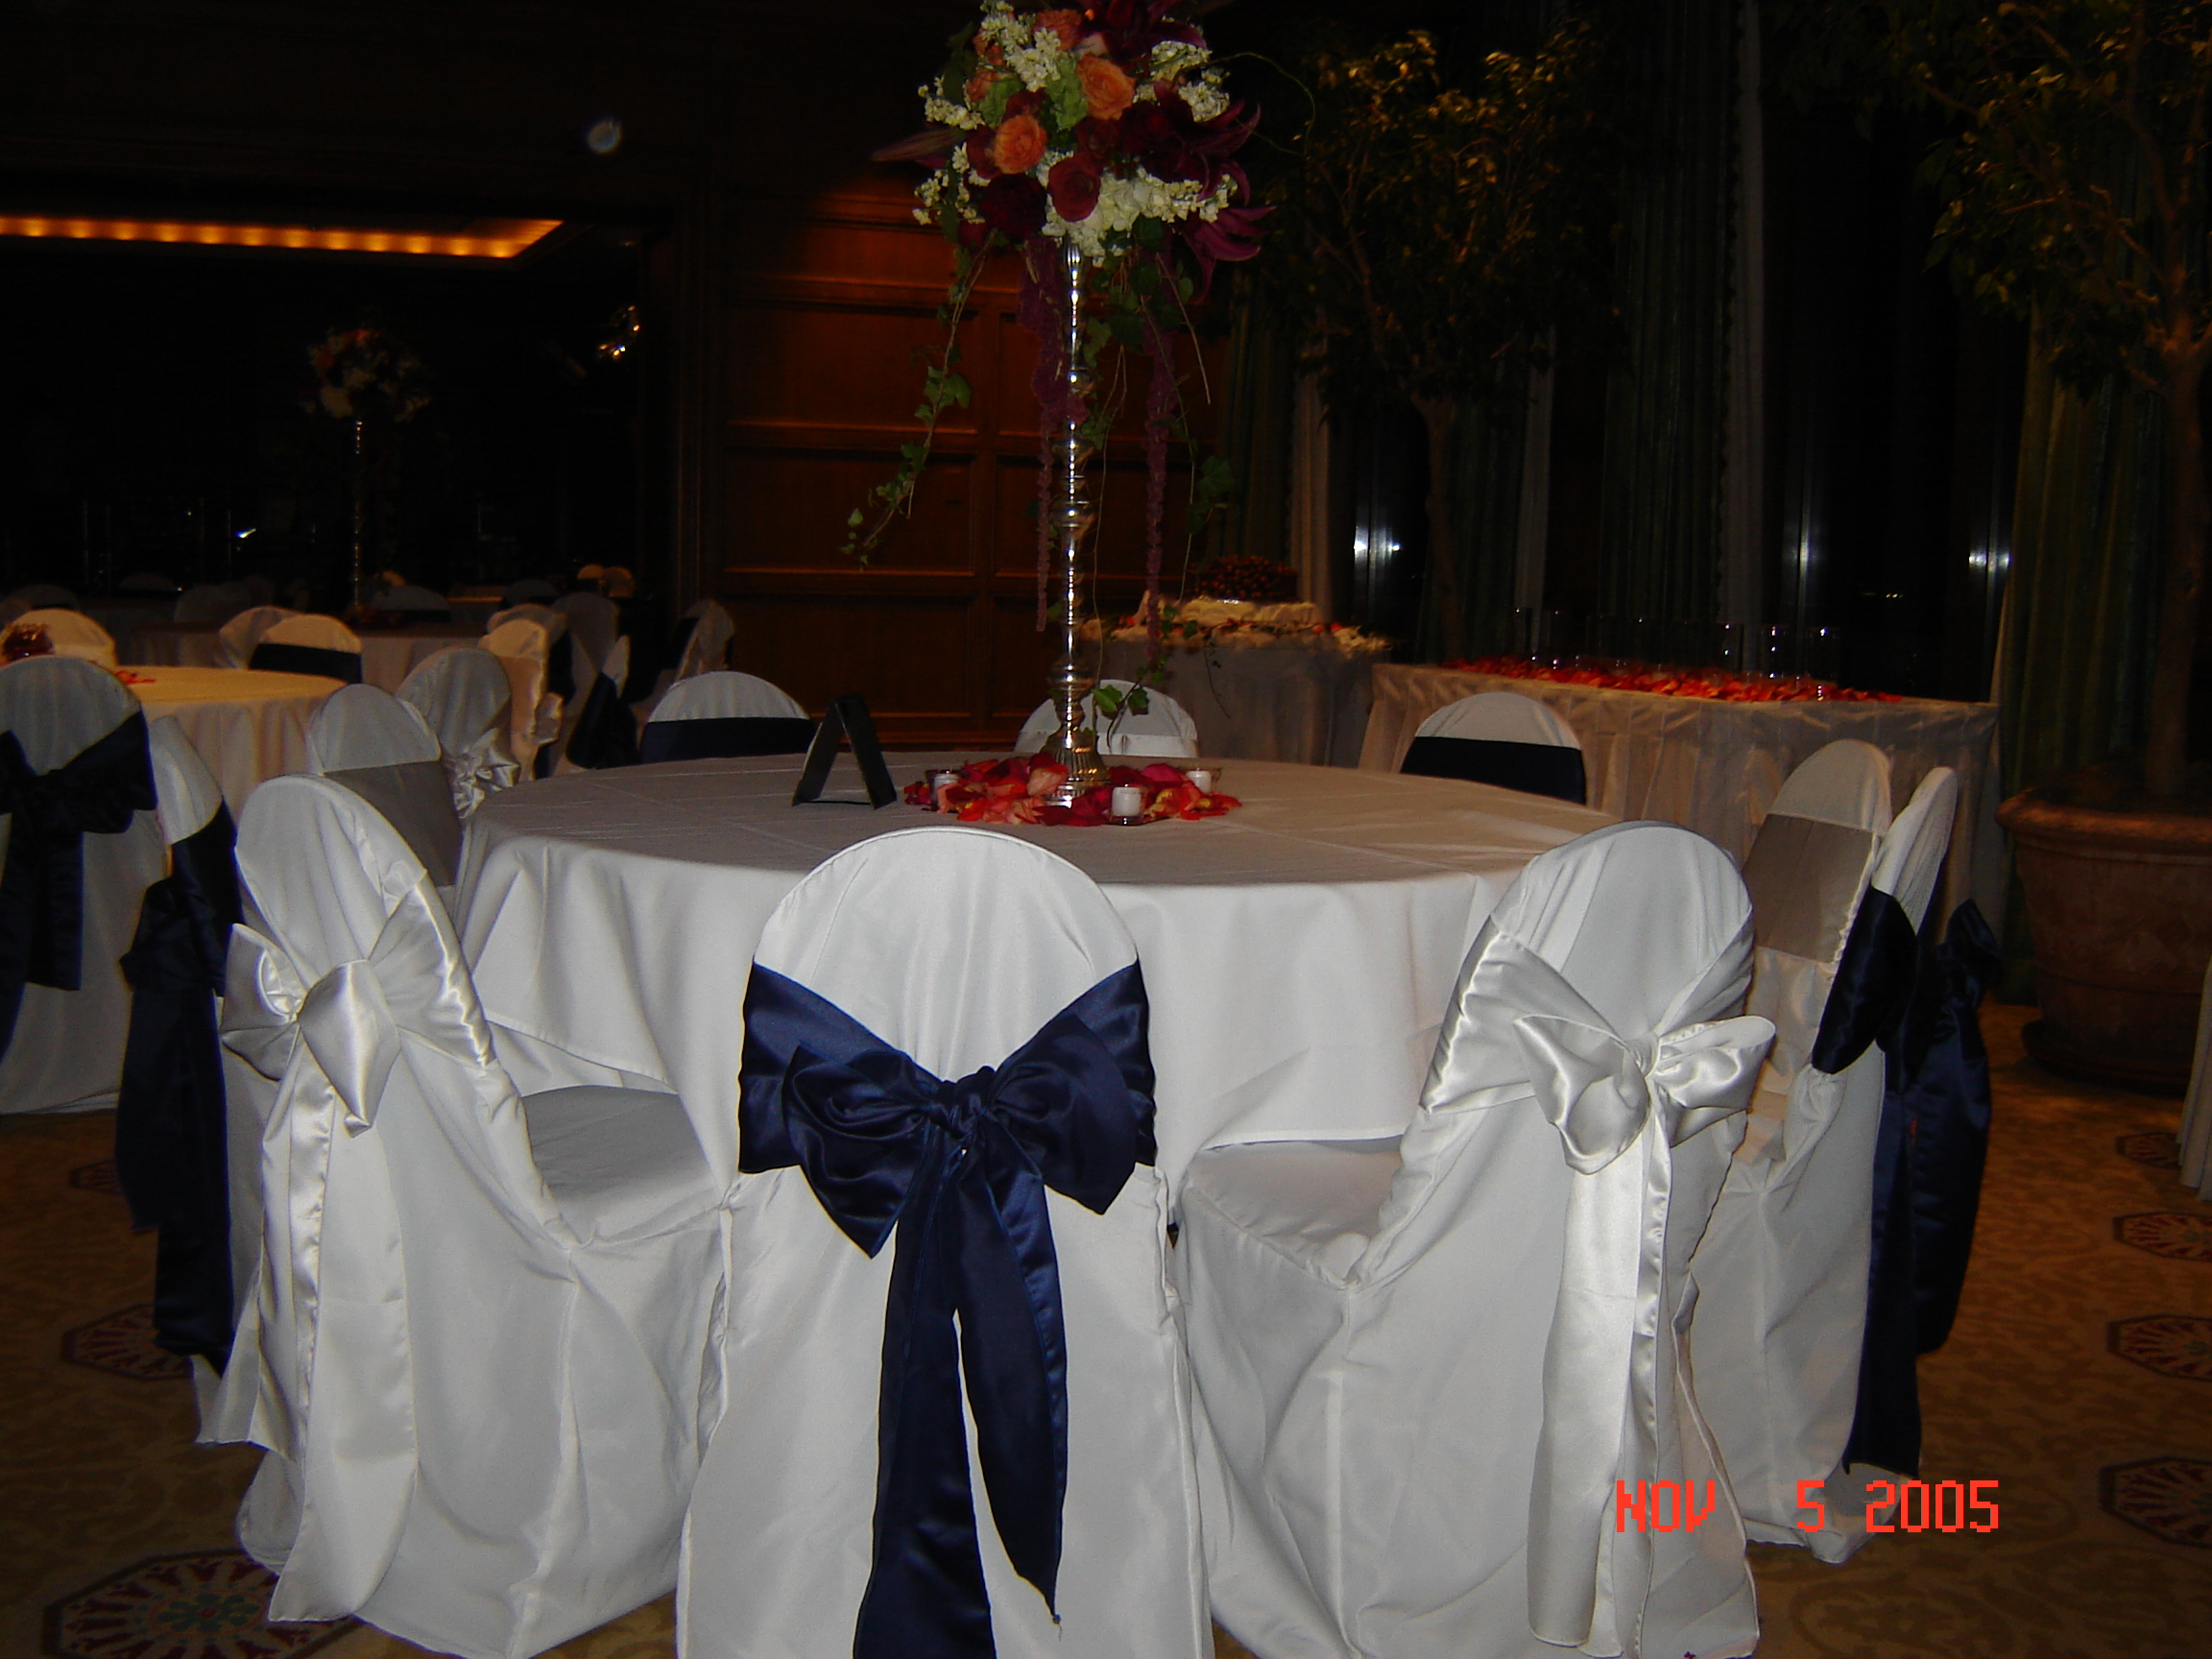 chair cover rentals dallas texas blue stretch covers simply elegant weddings wedding